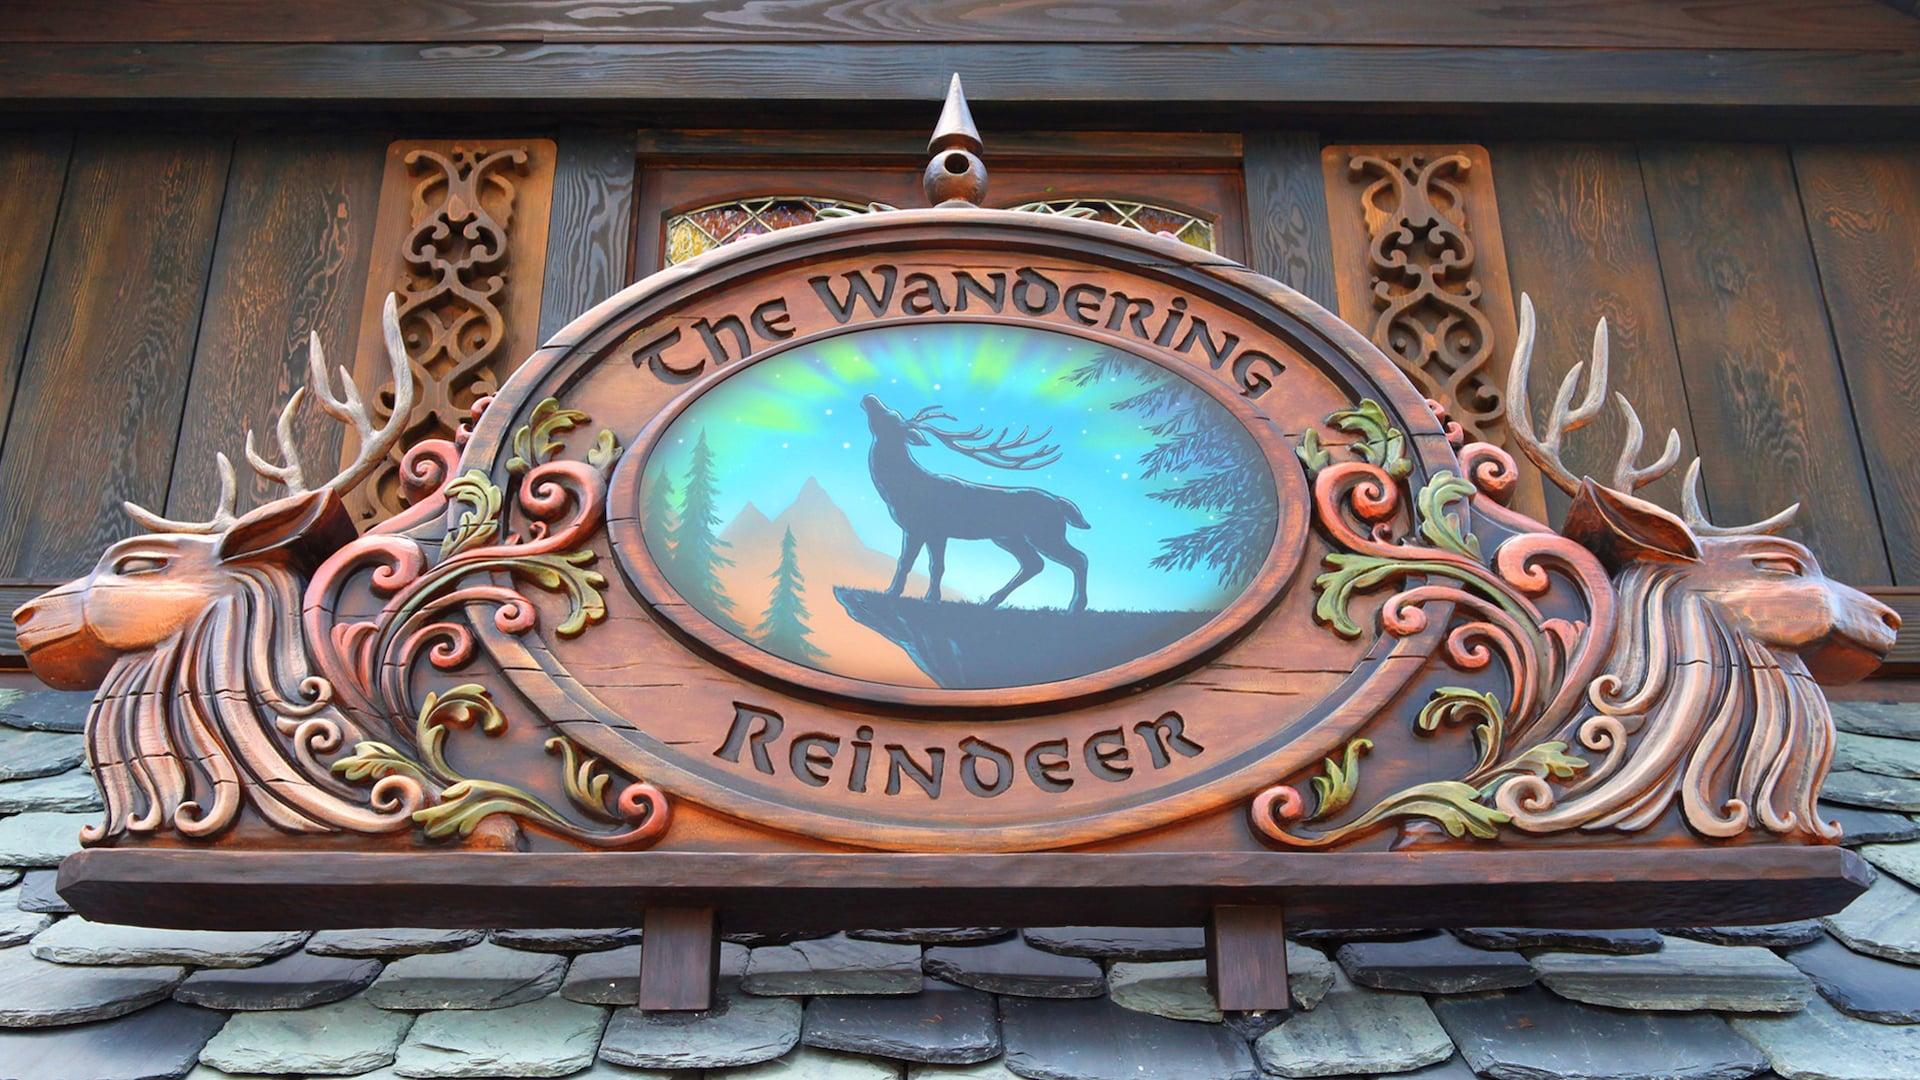 Wandering Reindeer – Costumes, Apparel & Plush Toys